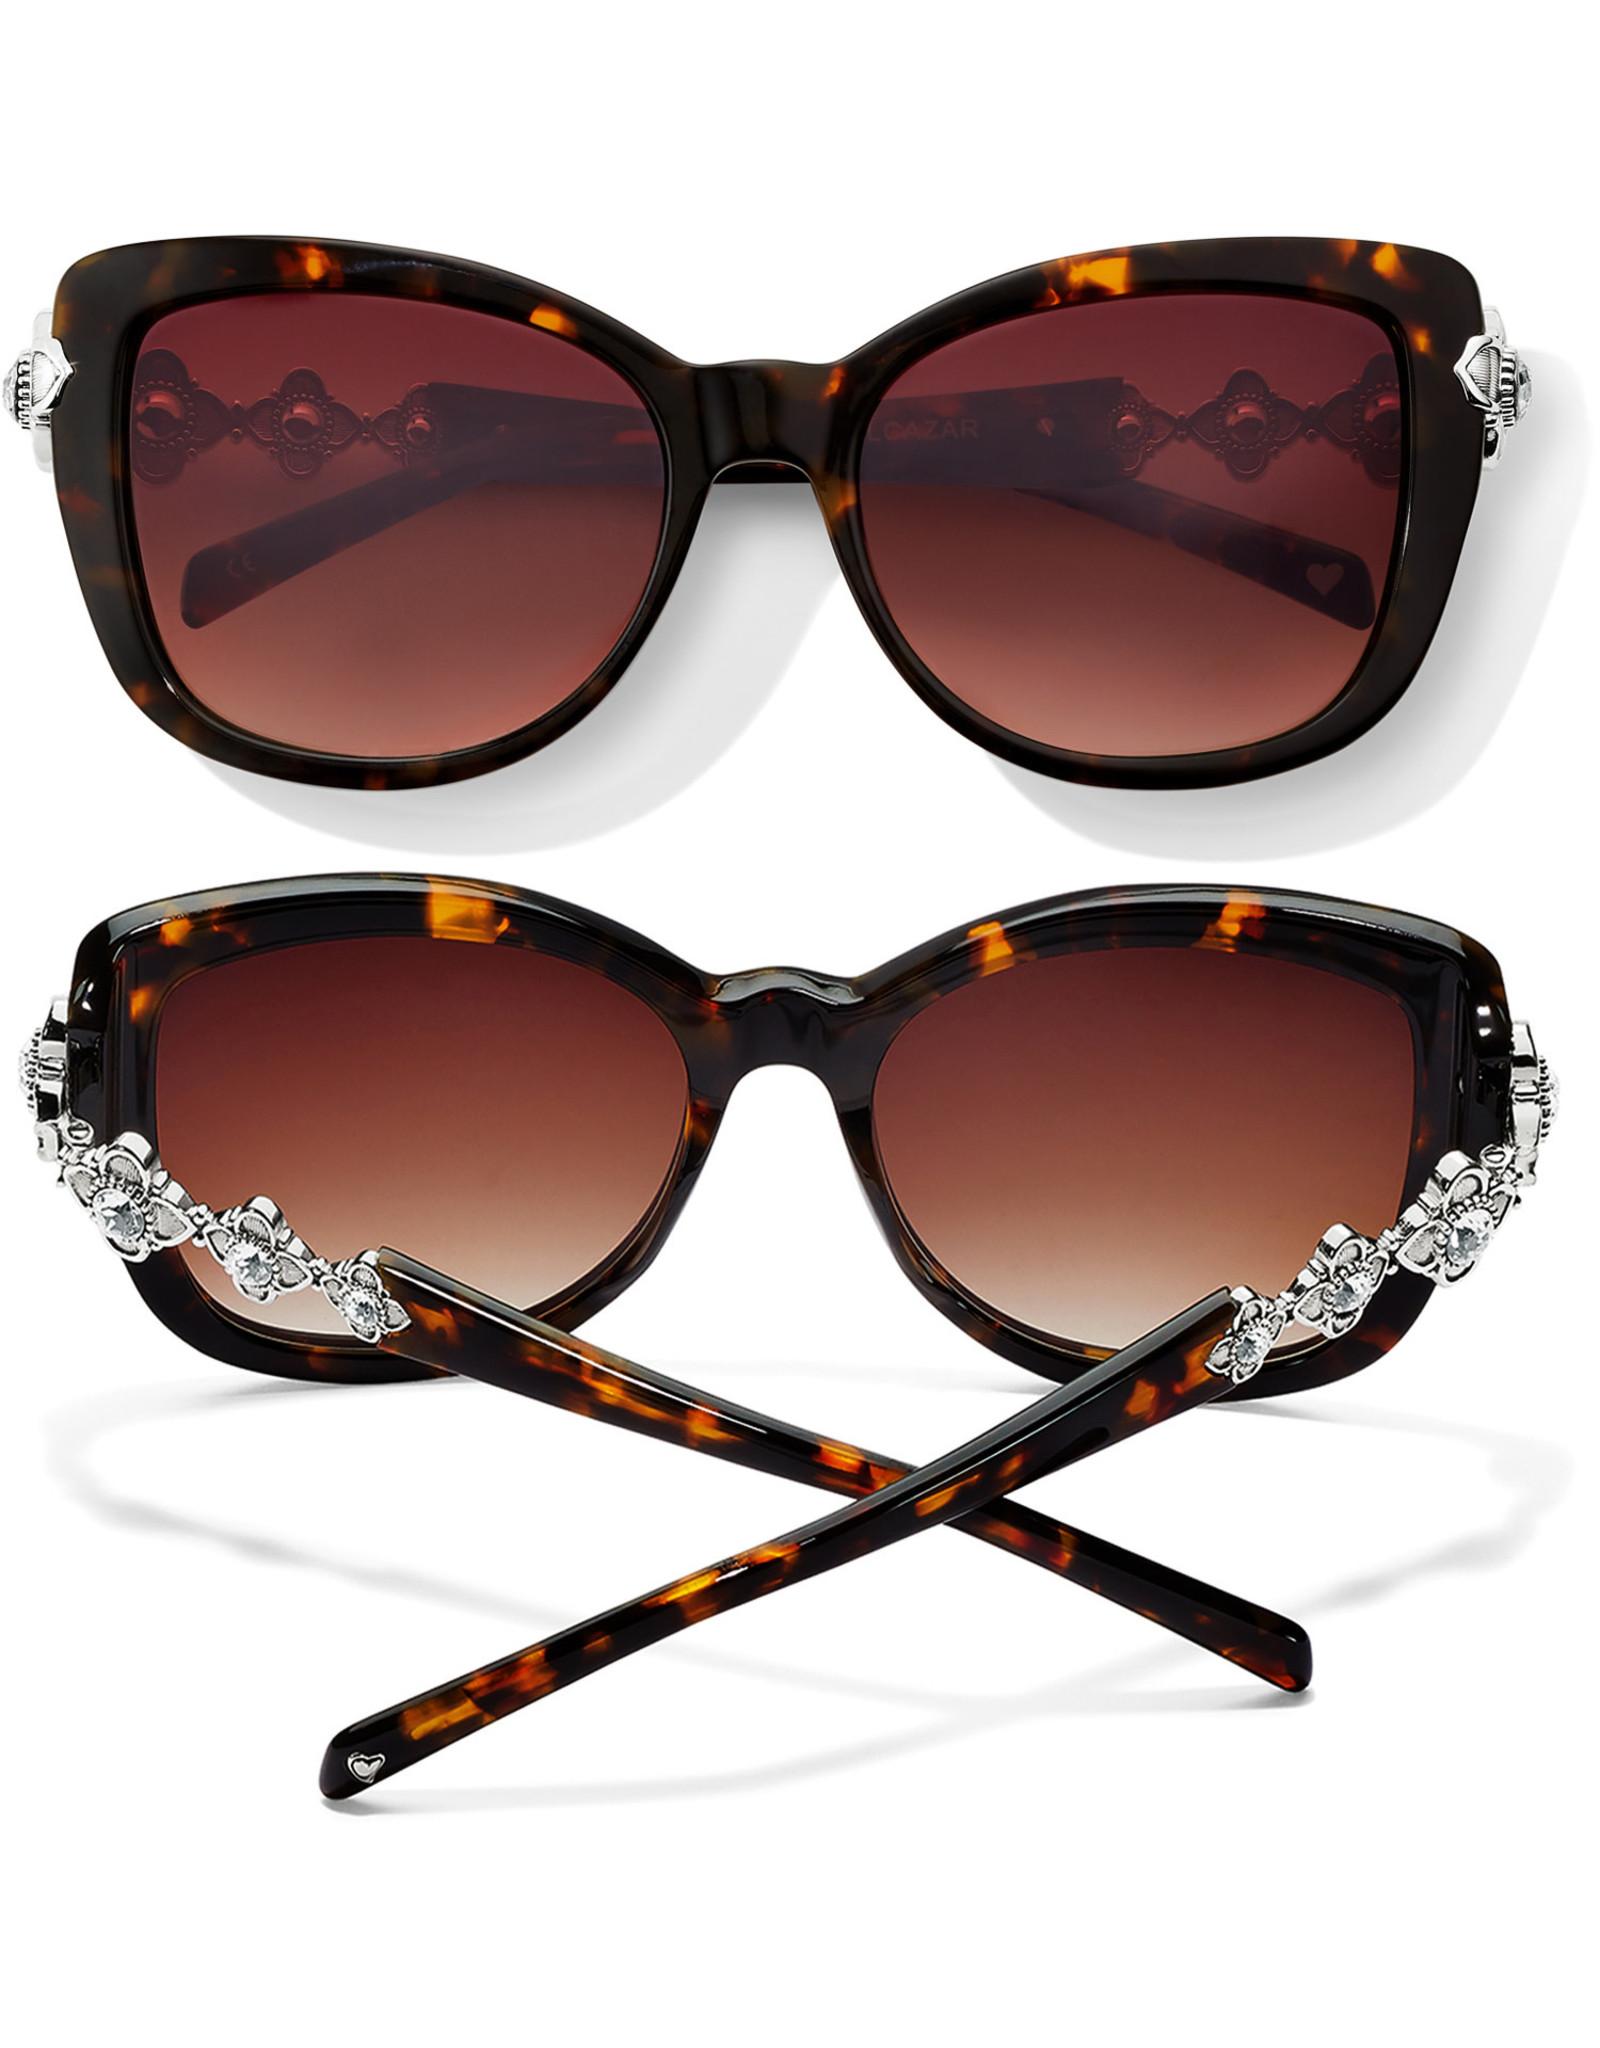 Brighton A12937 Alcazar Sunglasses